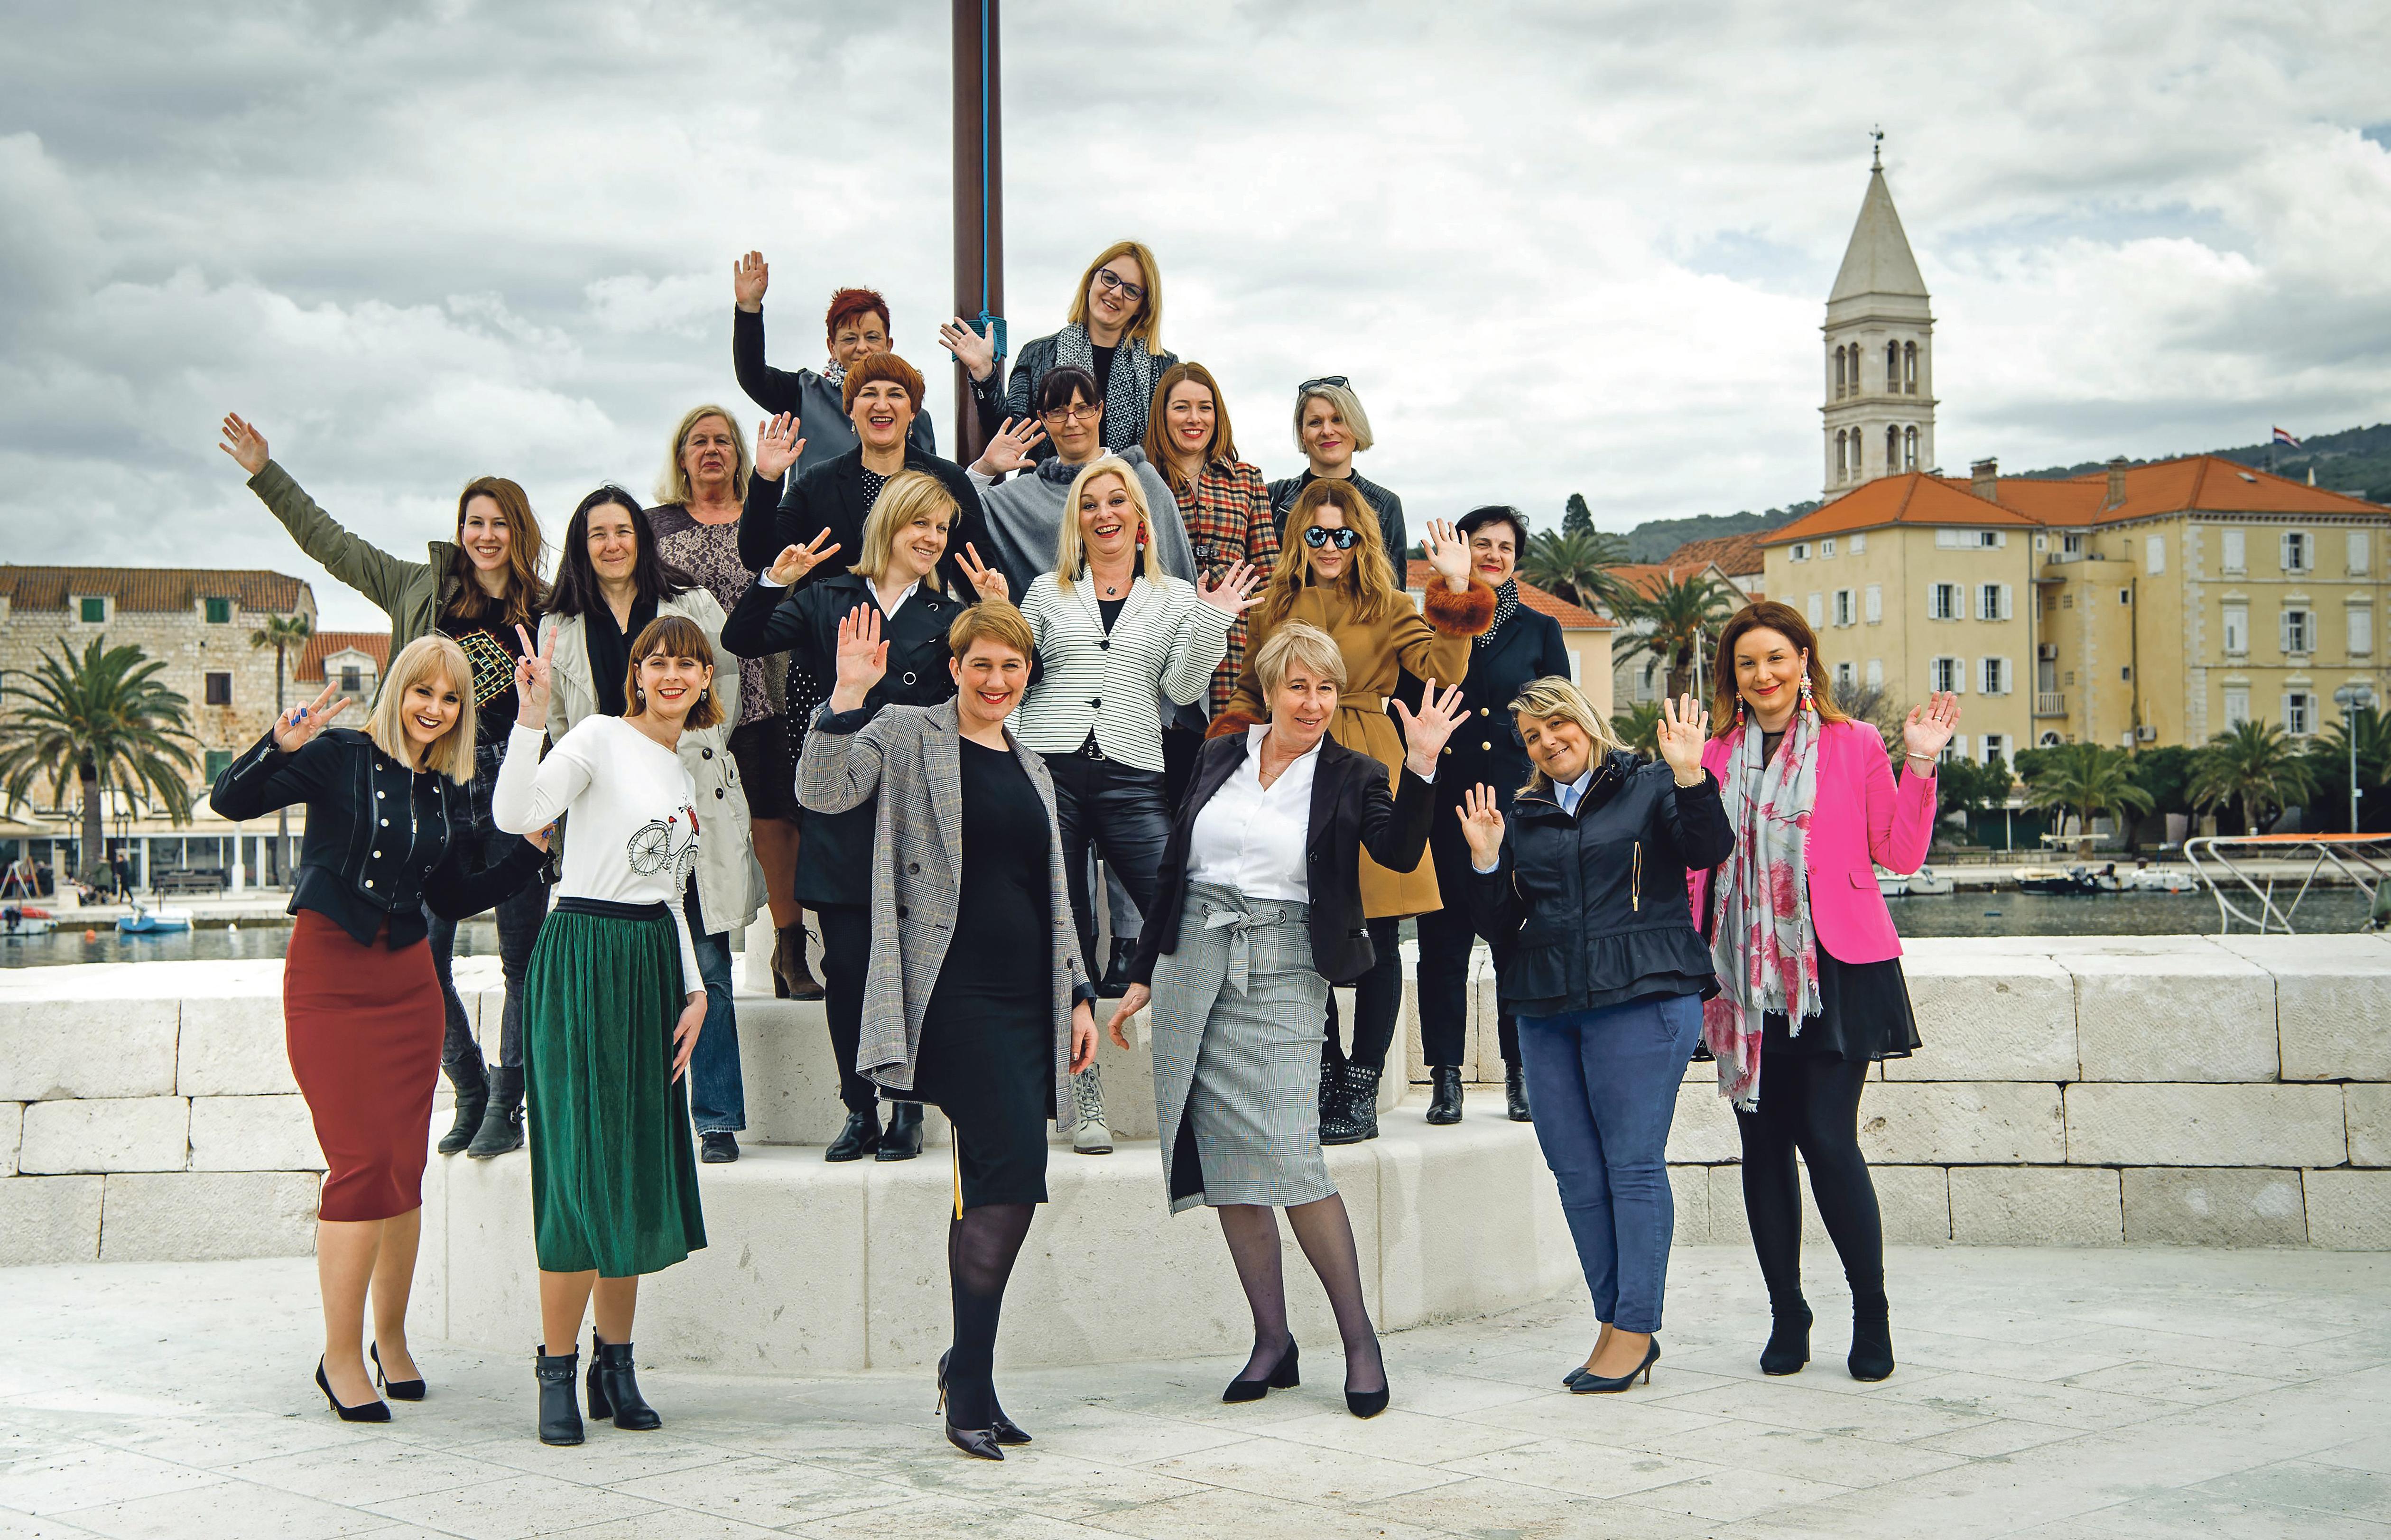 Fotografija profila upoznavanja u Zadar Hrvatska